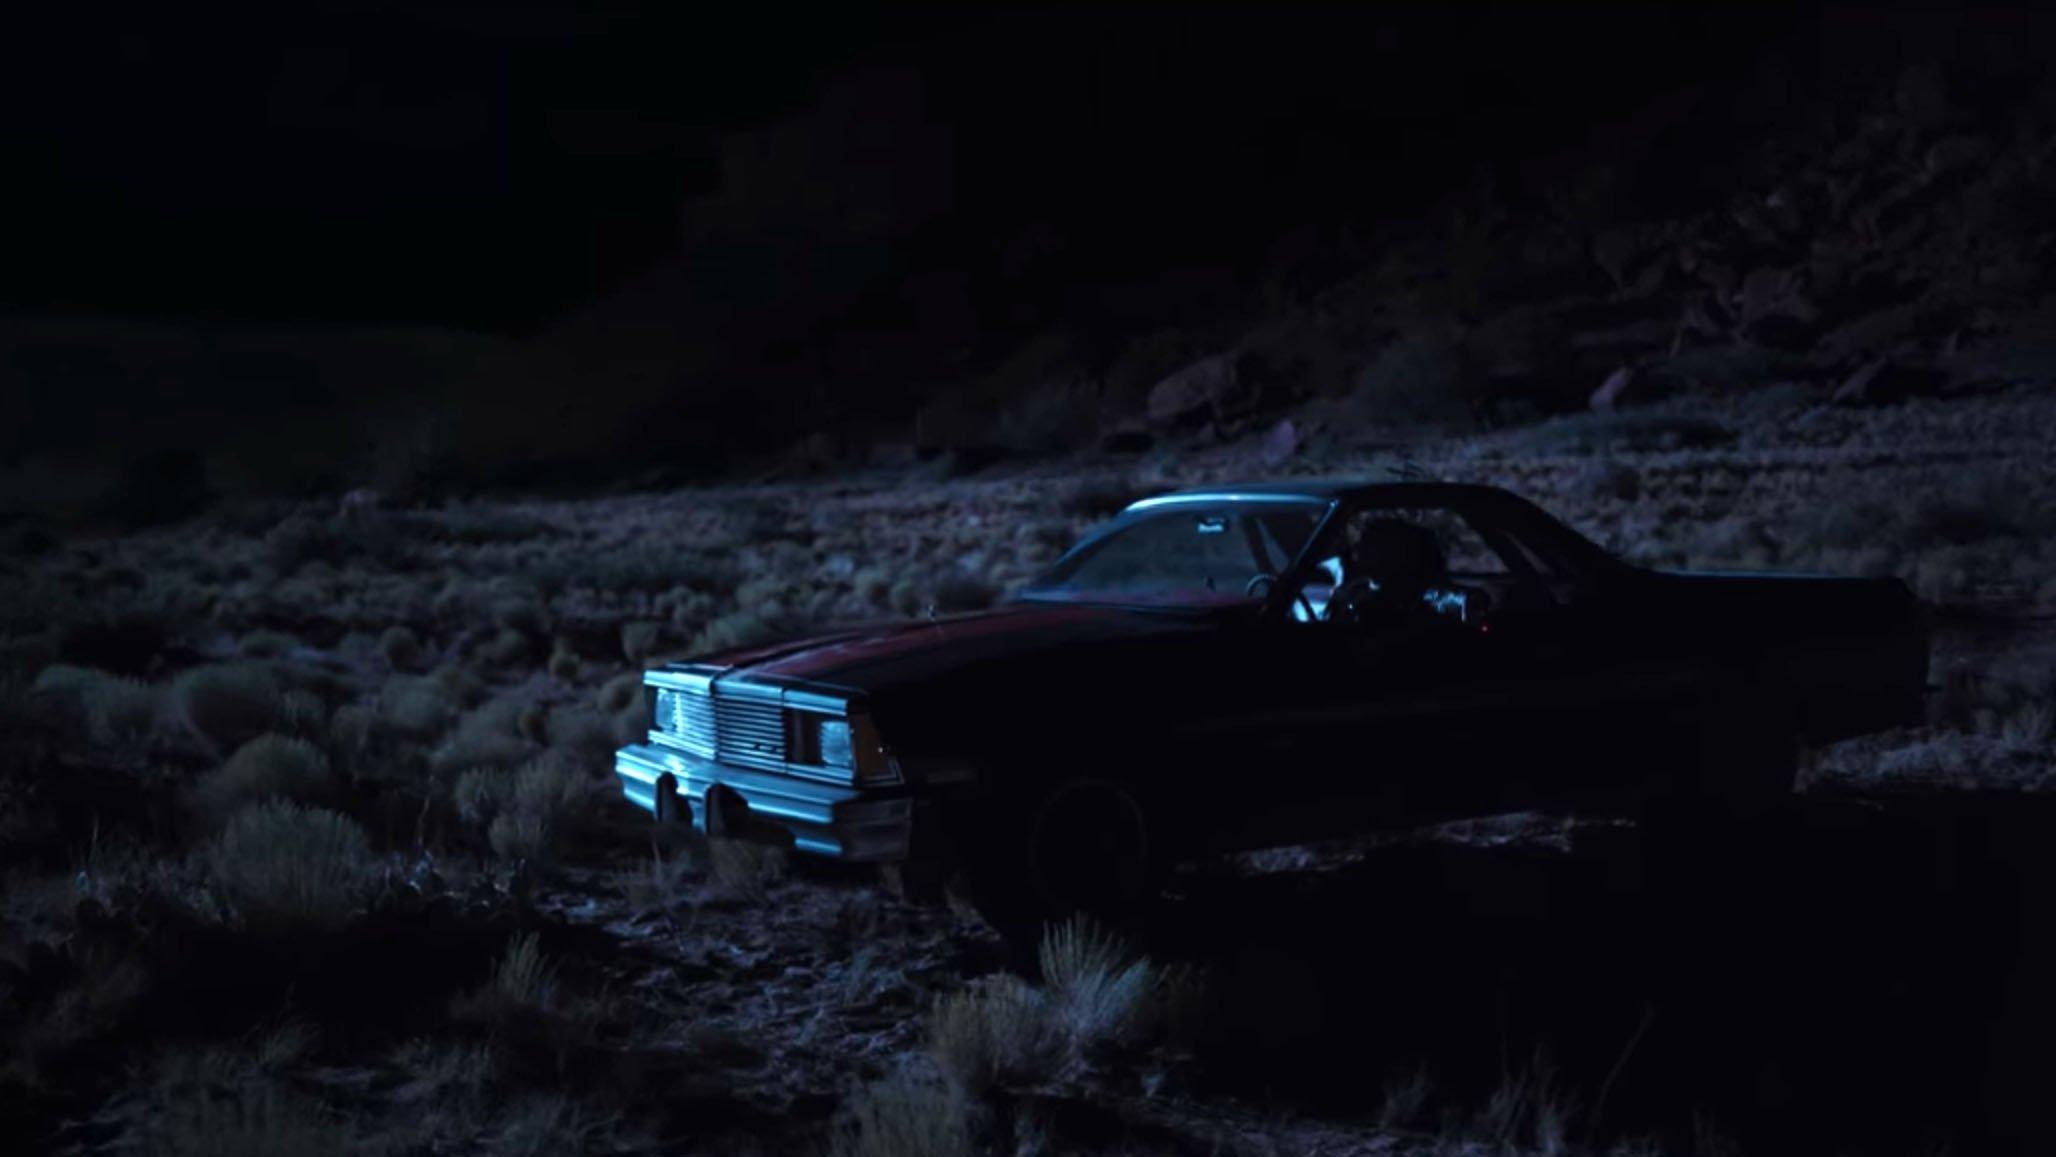 'El Camino: A Breaking Bad Movie' looks intense